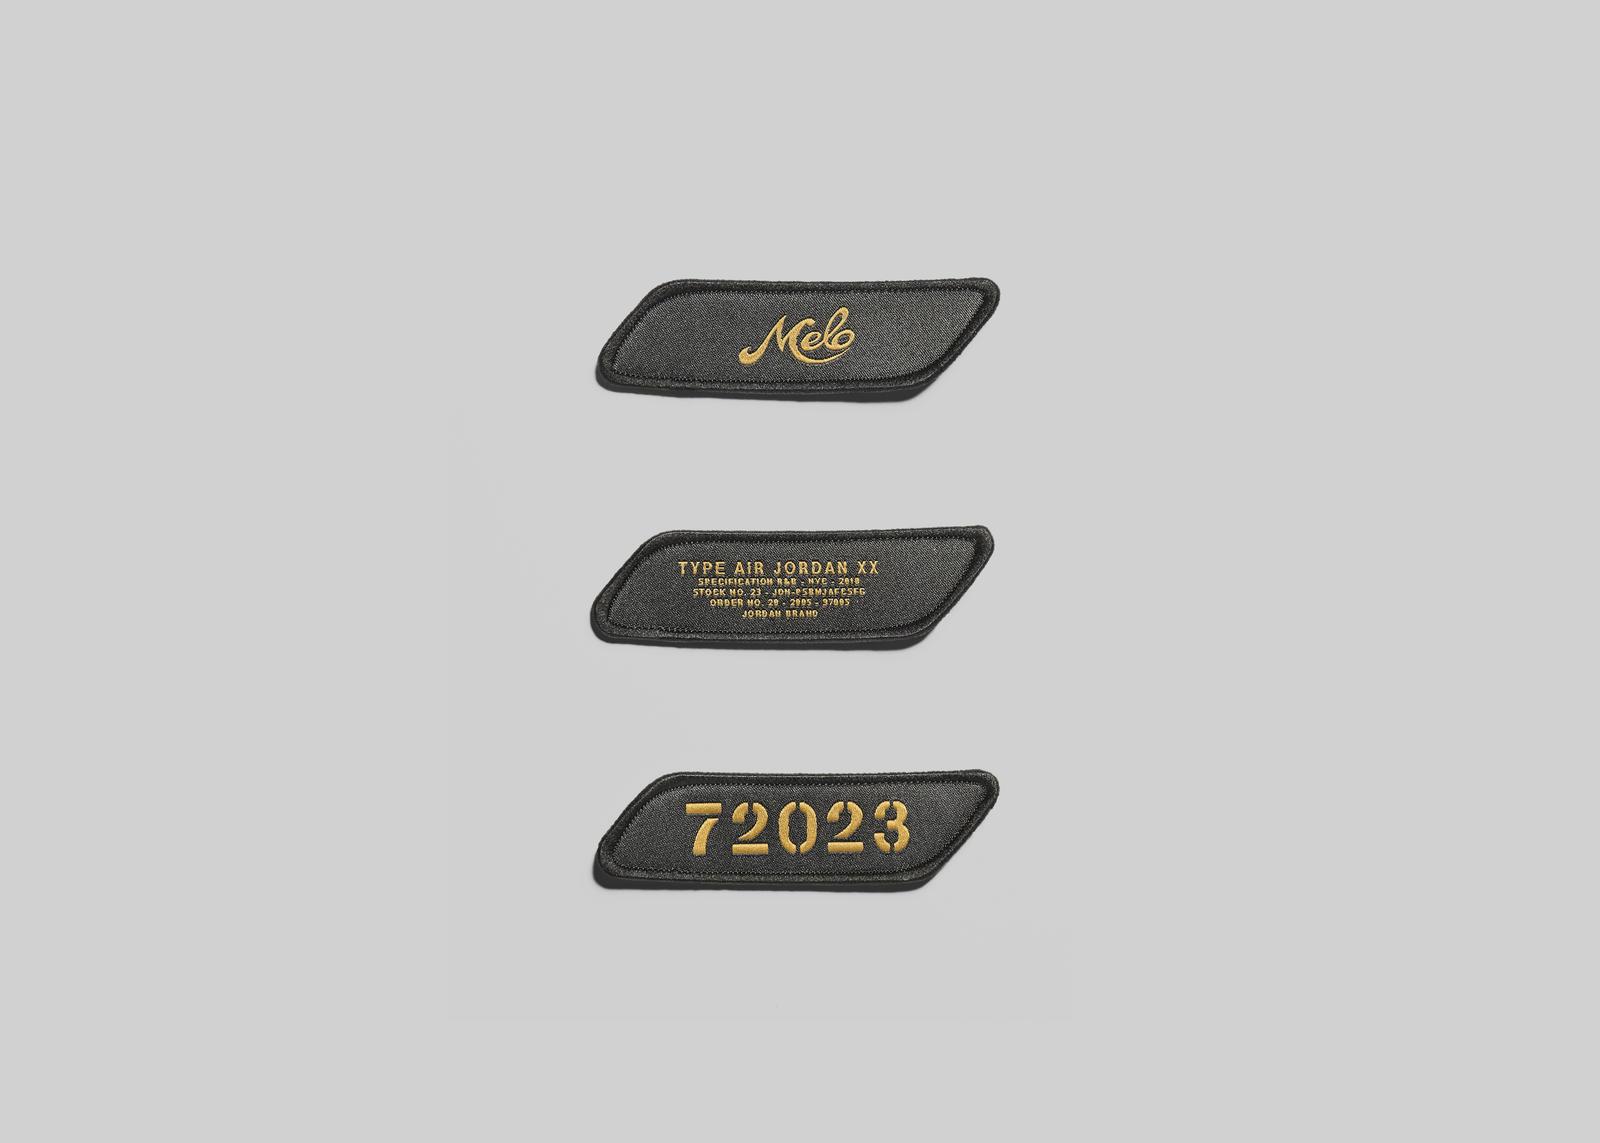 c007d713595 Jordan Brand x Carmelo Anthony x Rag & Bone Capsule 30. The Carmelo Anthony  x rag & bone AJXX includes ...